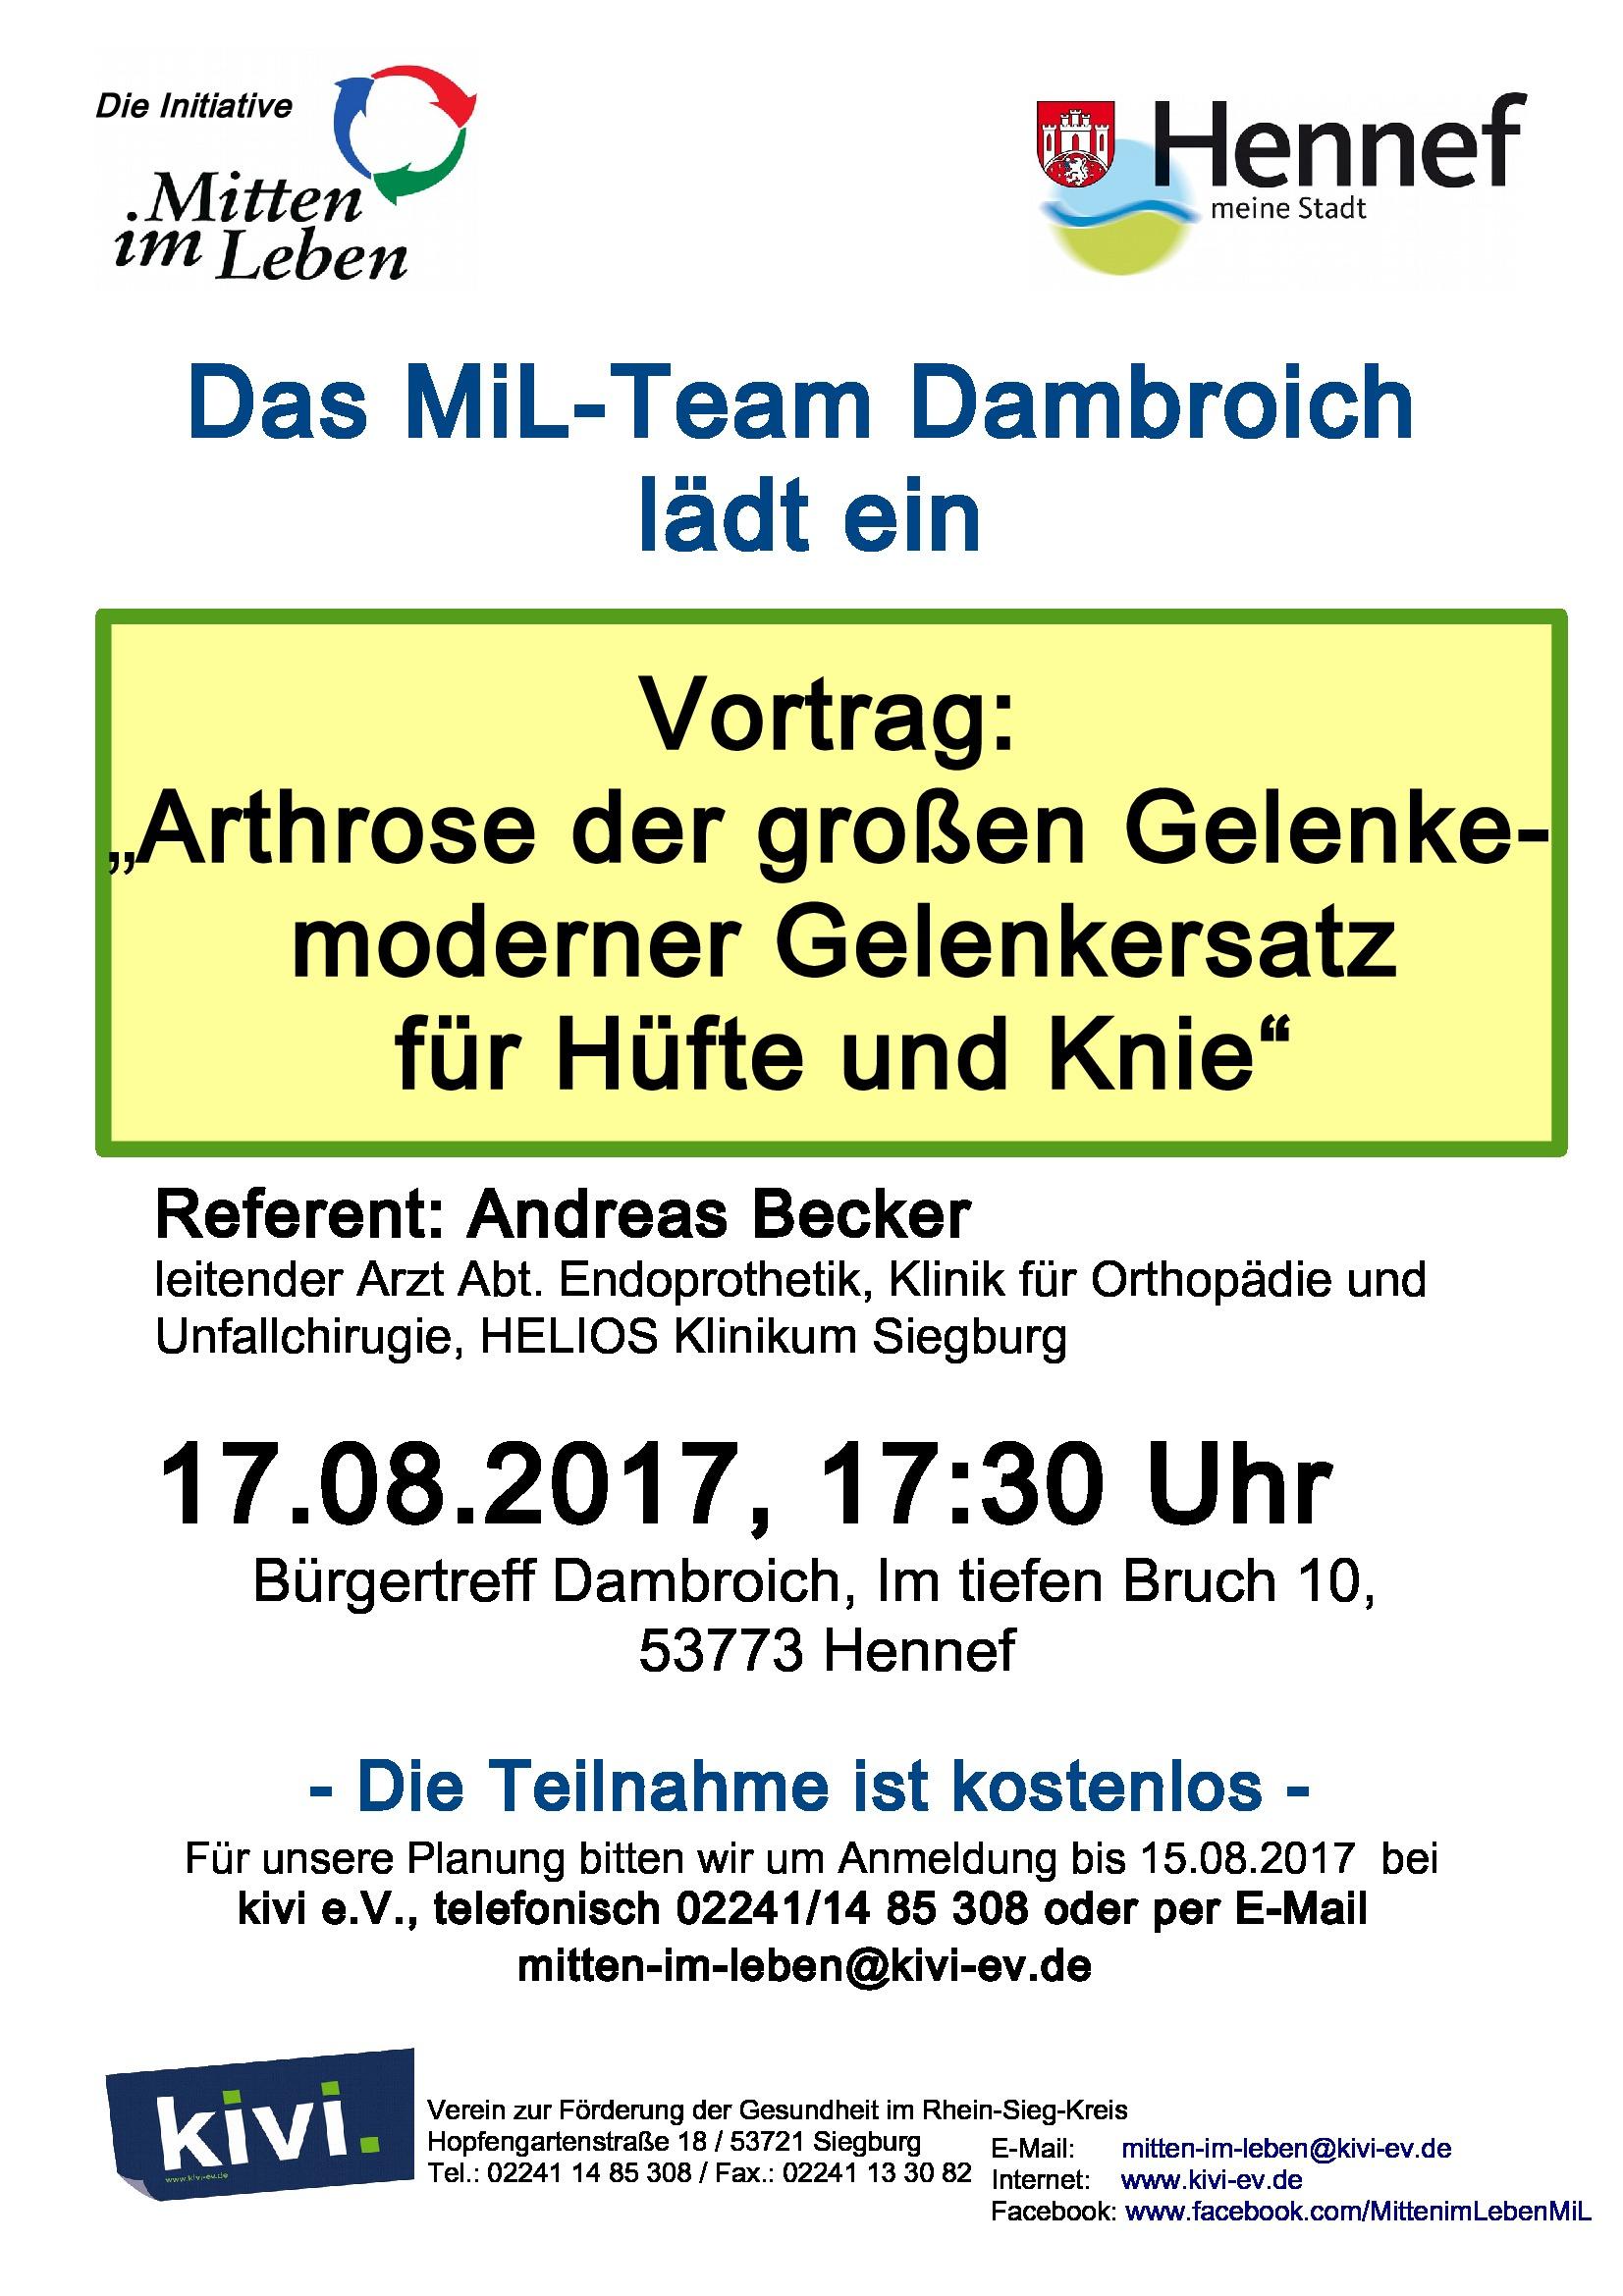 2017 – bürgerverein dambroich e.v., Einladungen